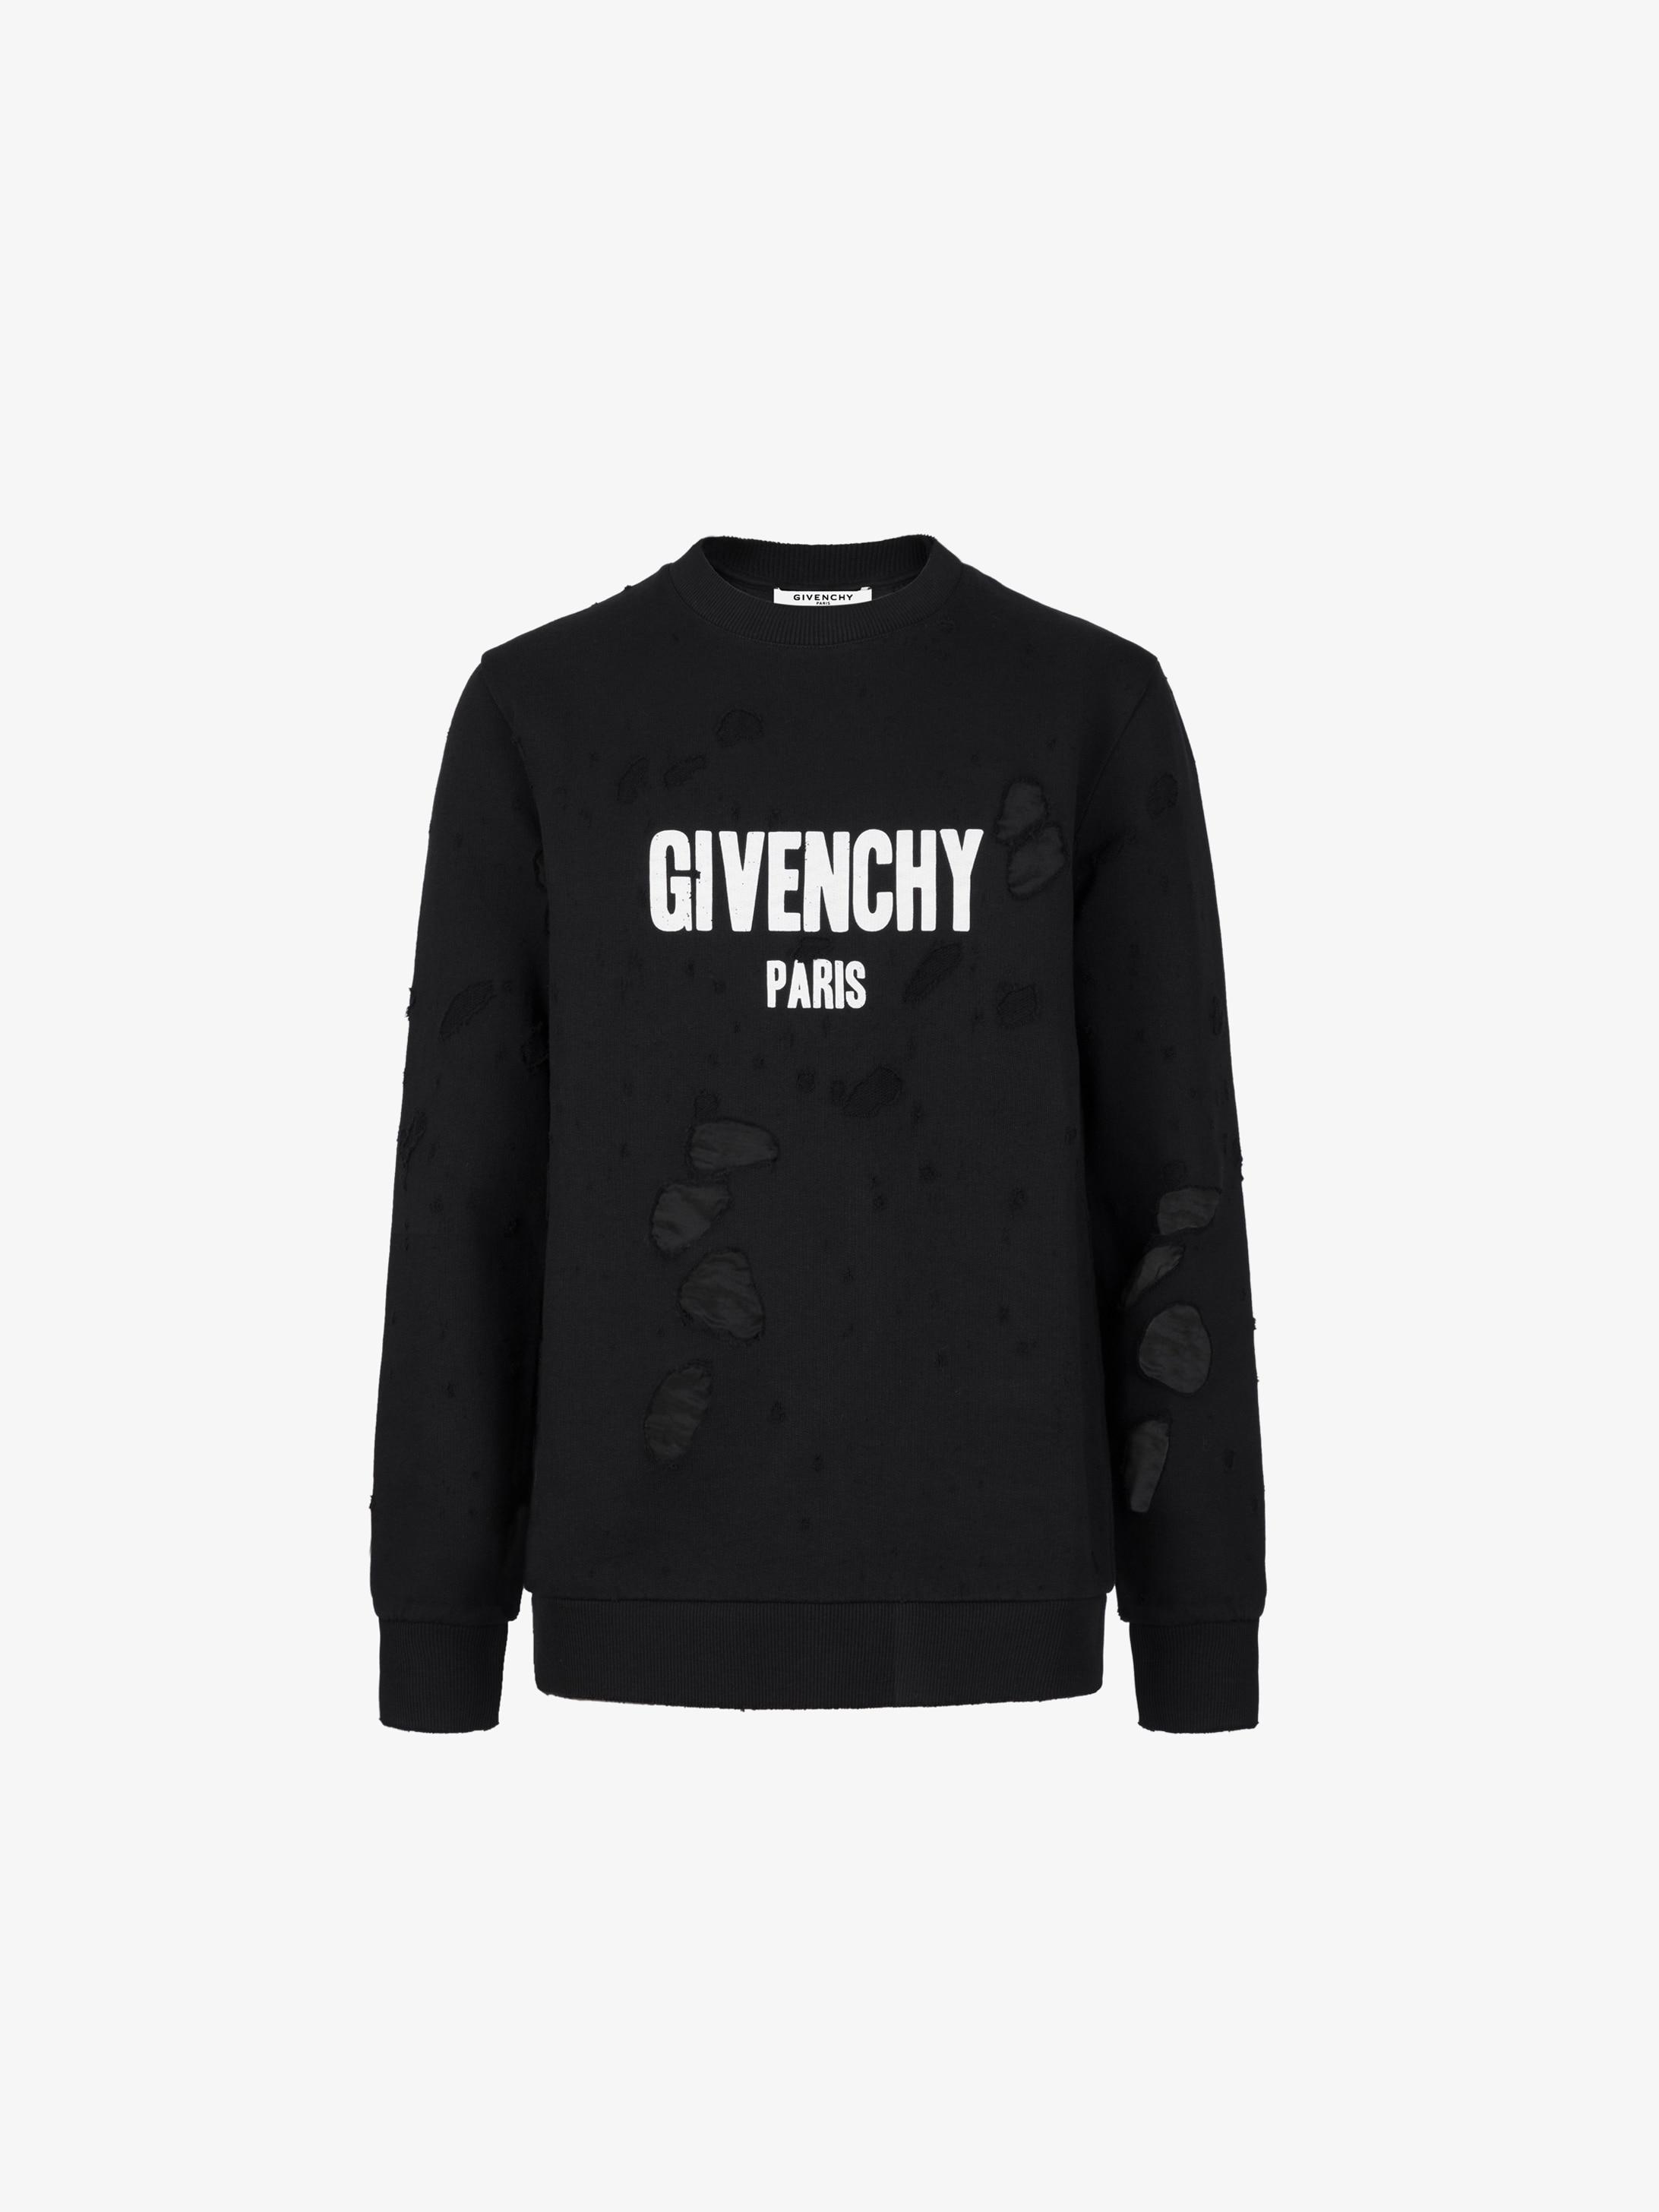 GIVENCHY PARIS destroyed sweatshirt